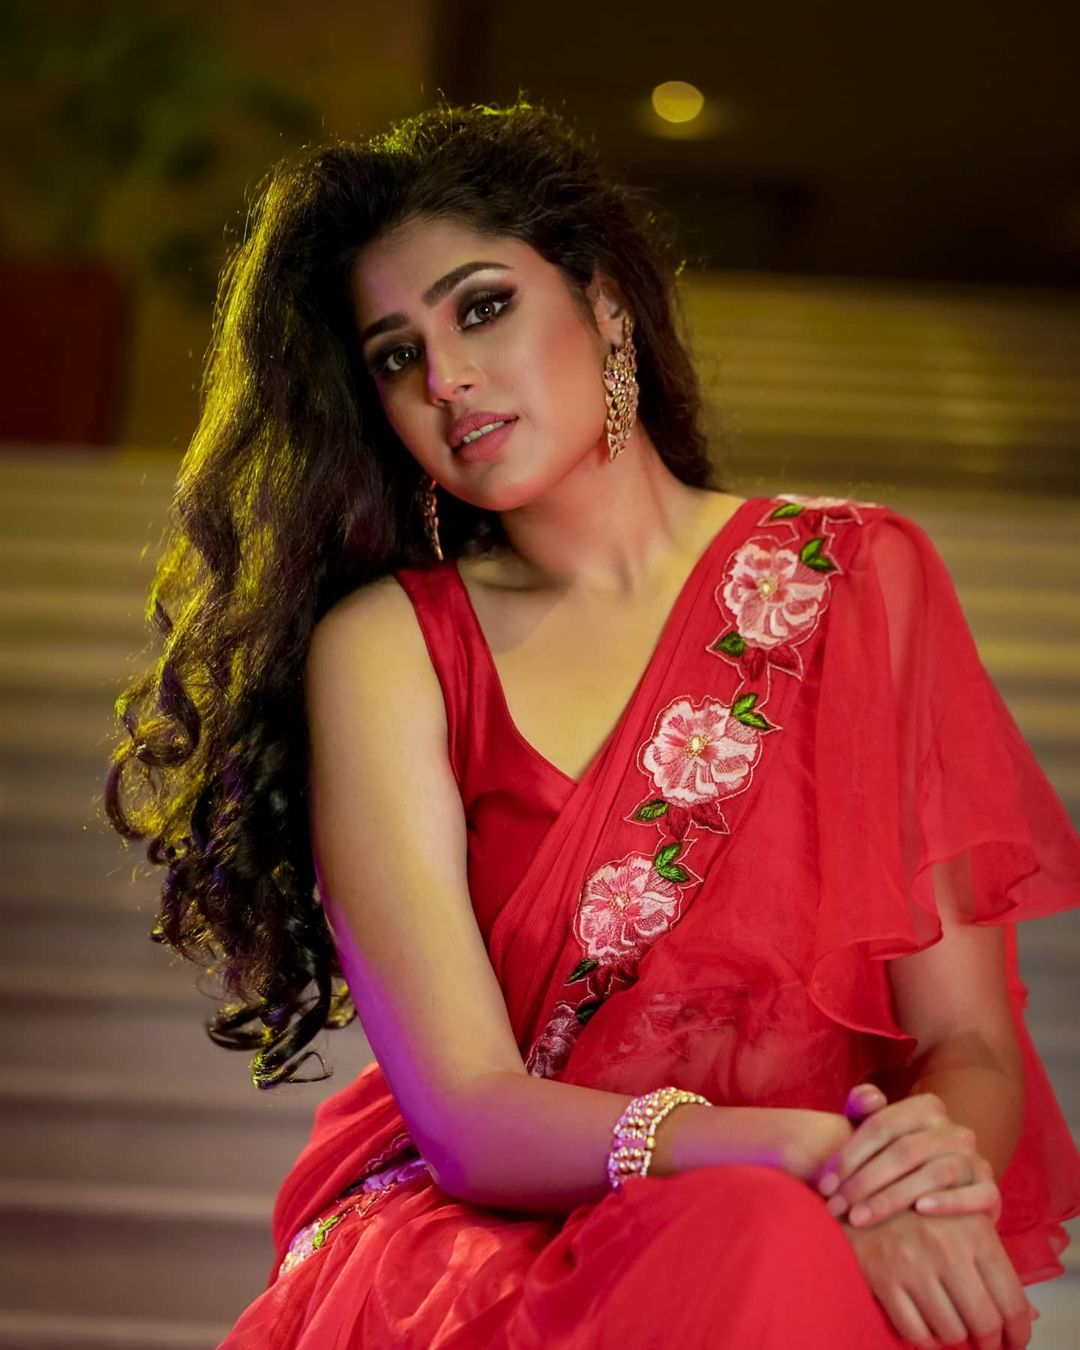 Faria Abdullah images in saree